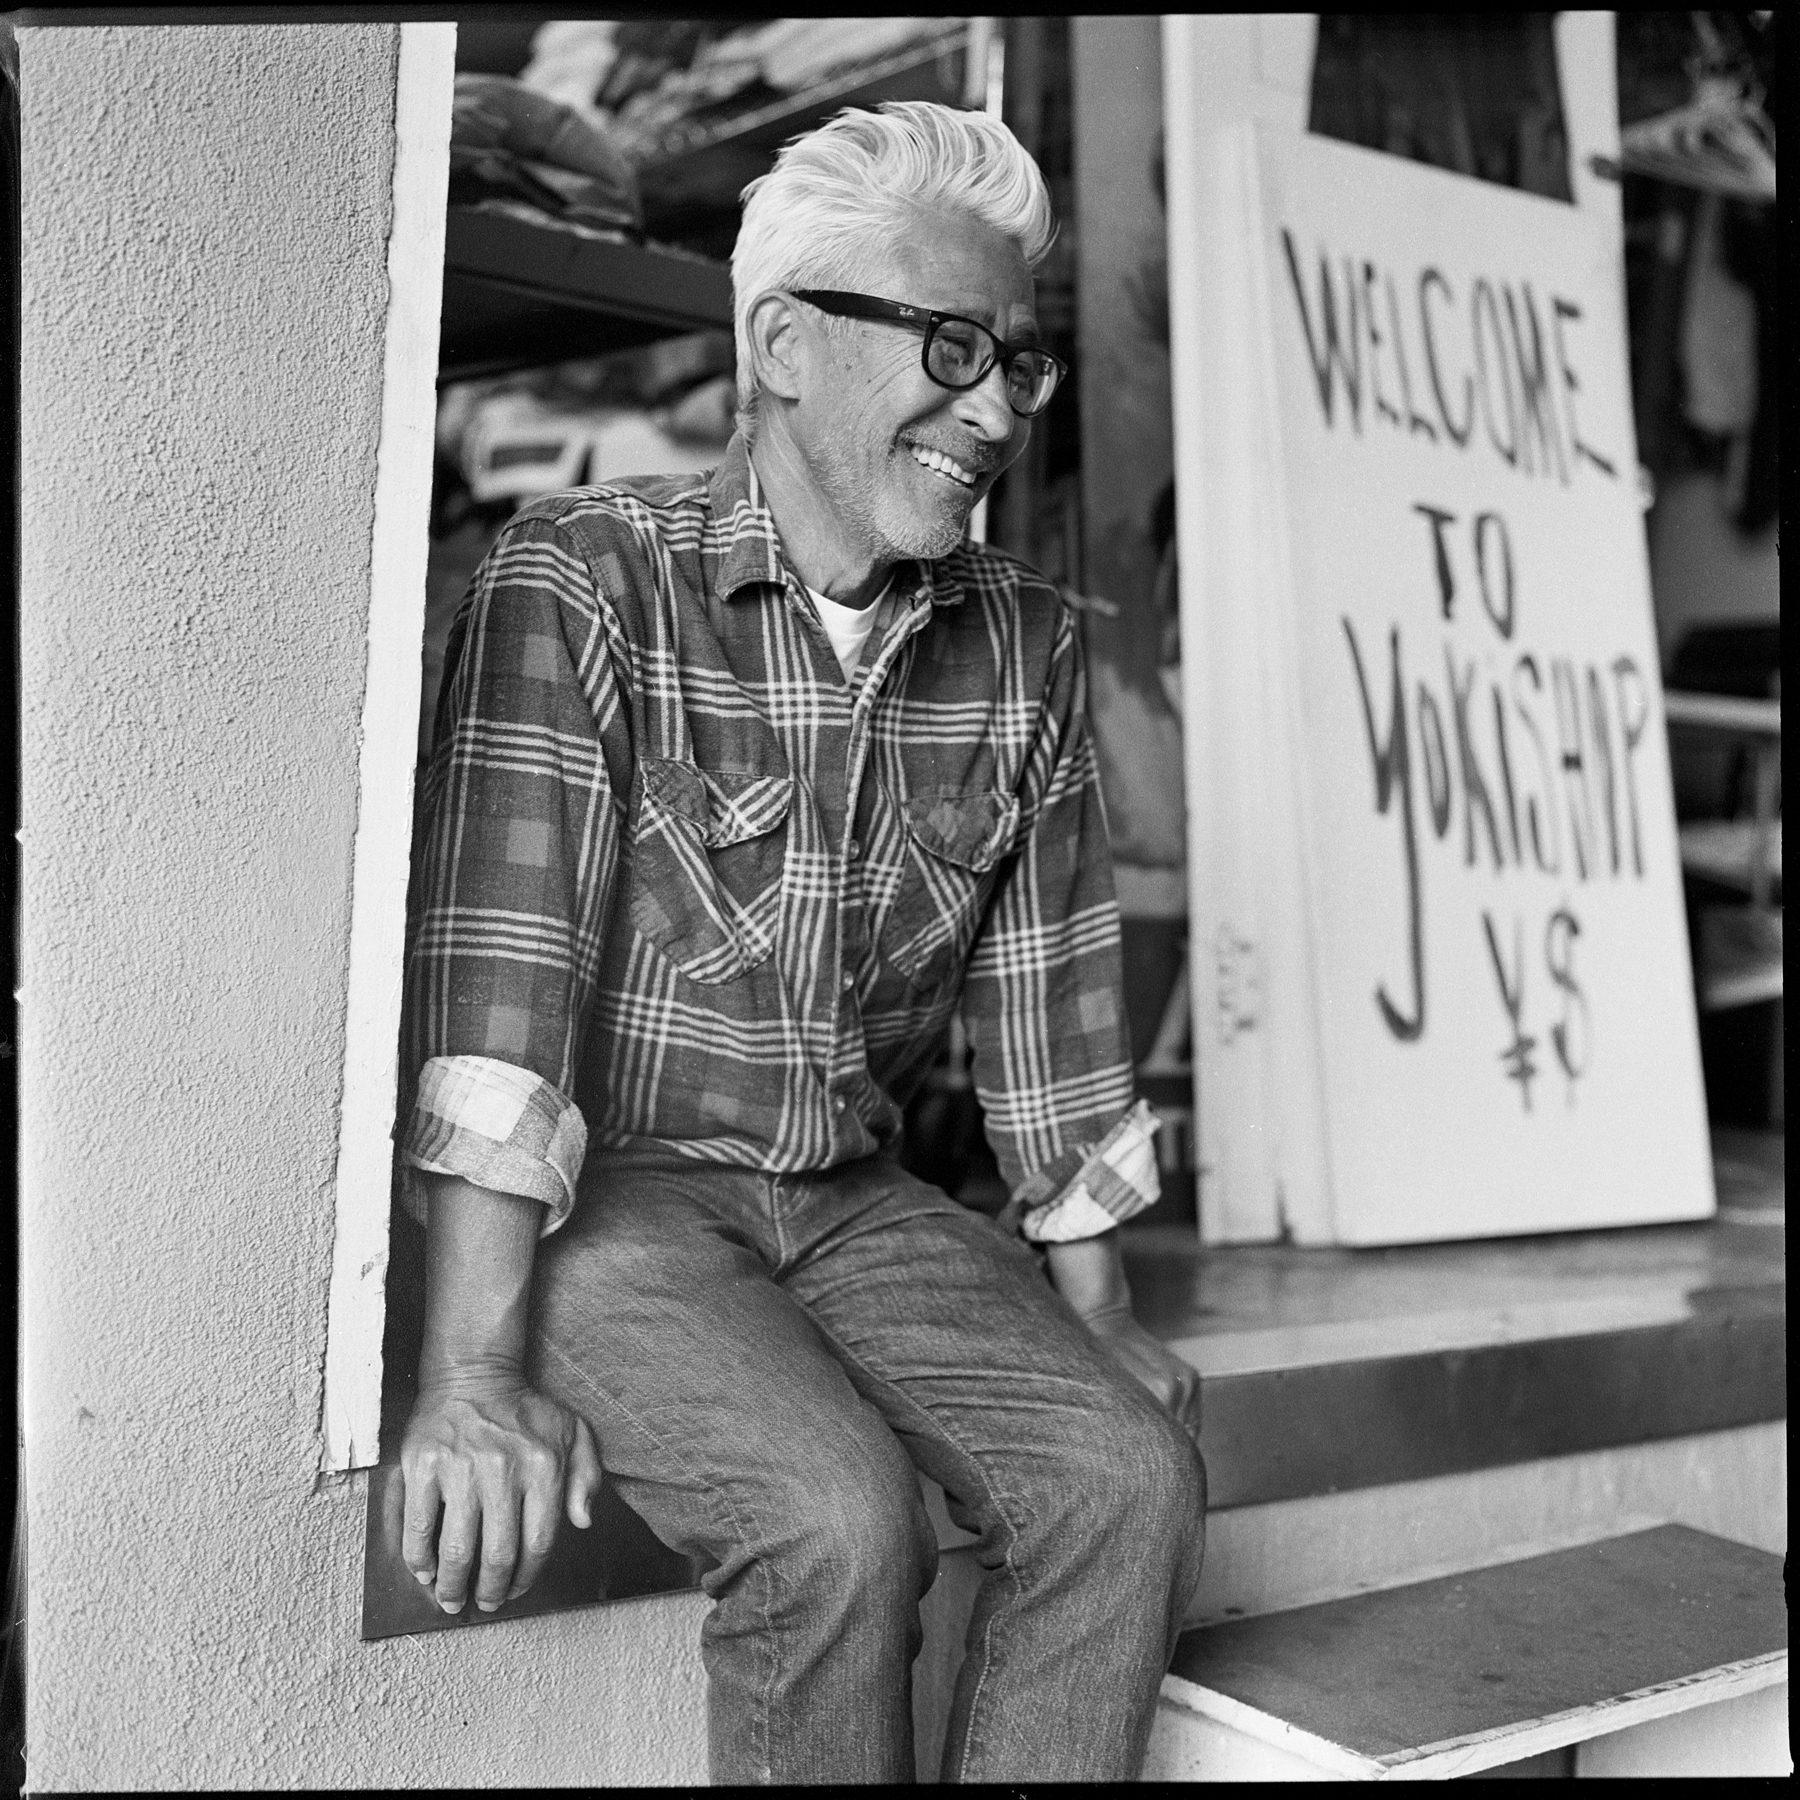 Portrait of Yoki by Brett Hillyard on ILFORD black and white HP5+ Film